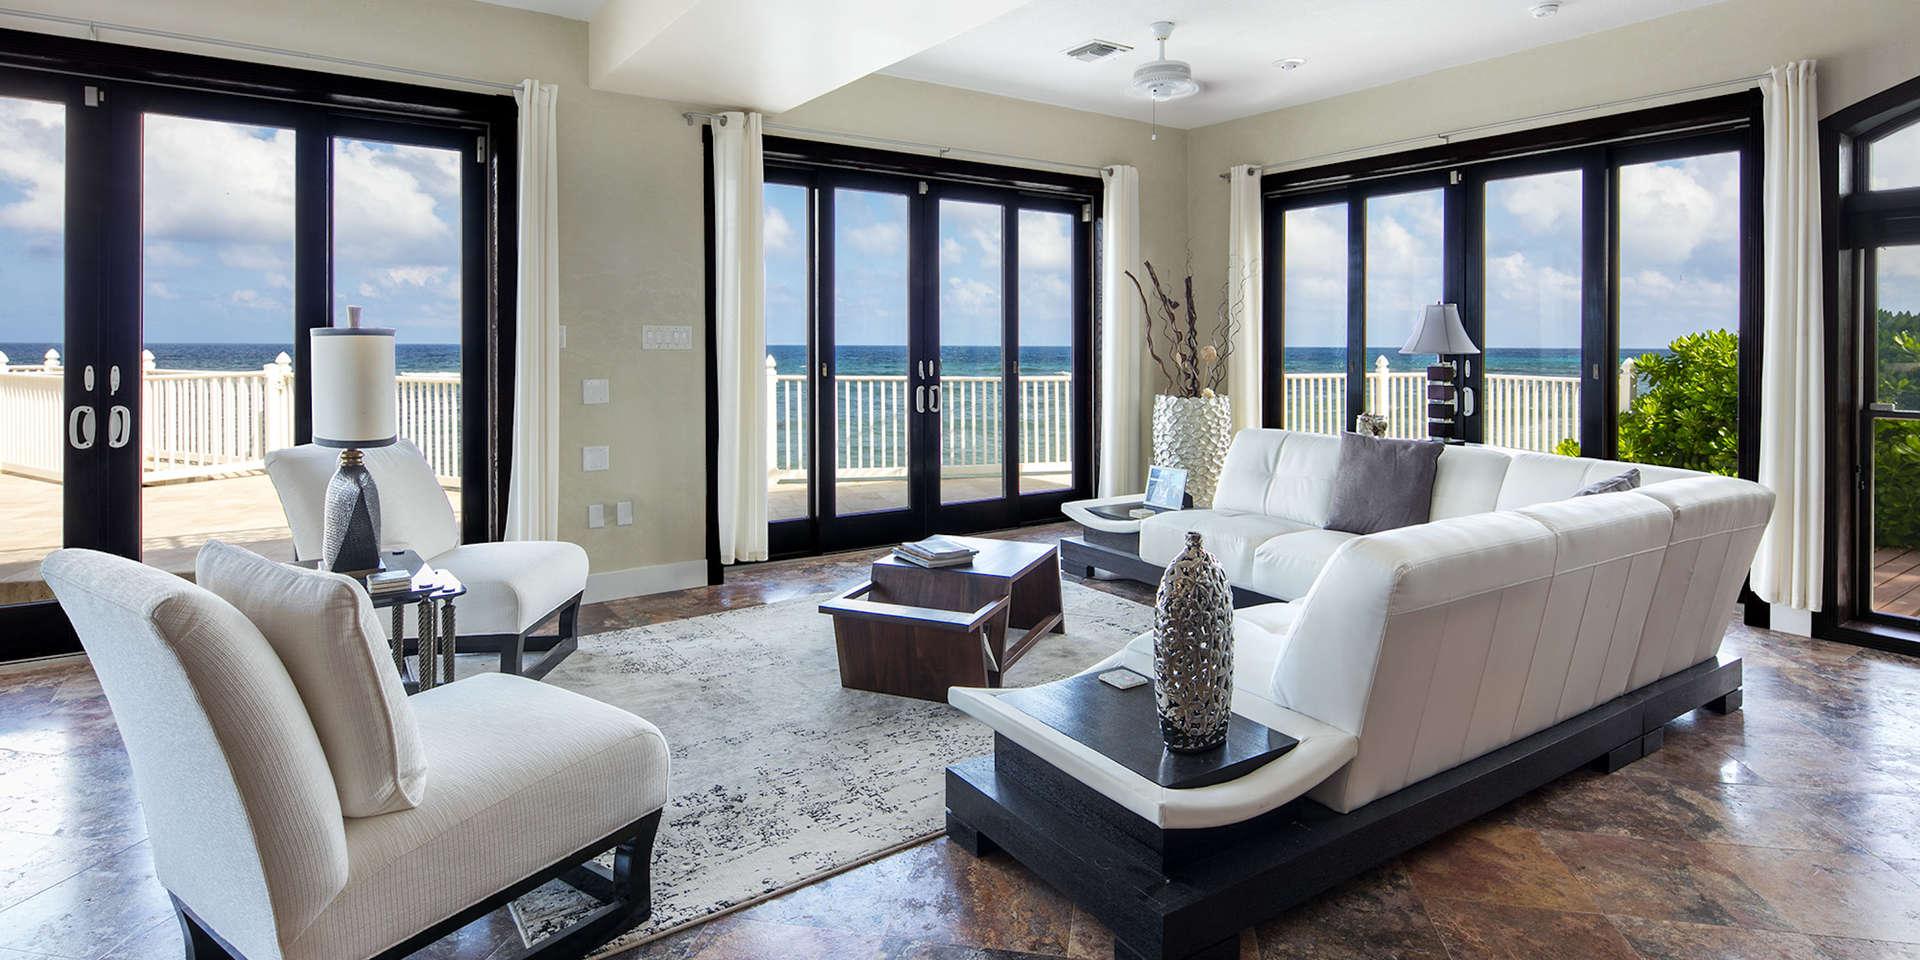 Luxury villa rentals caribbean - Cayman islands - Grand cayman - Old man bay - KiToCay - Image 1/12